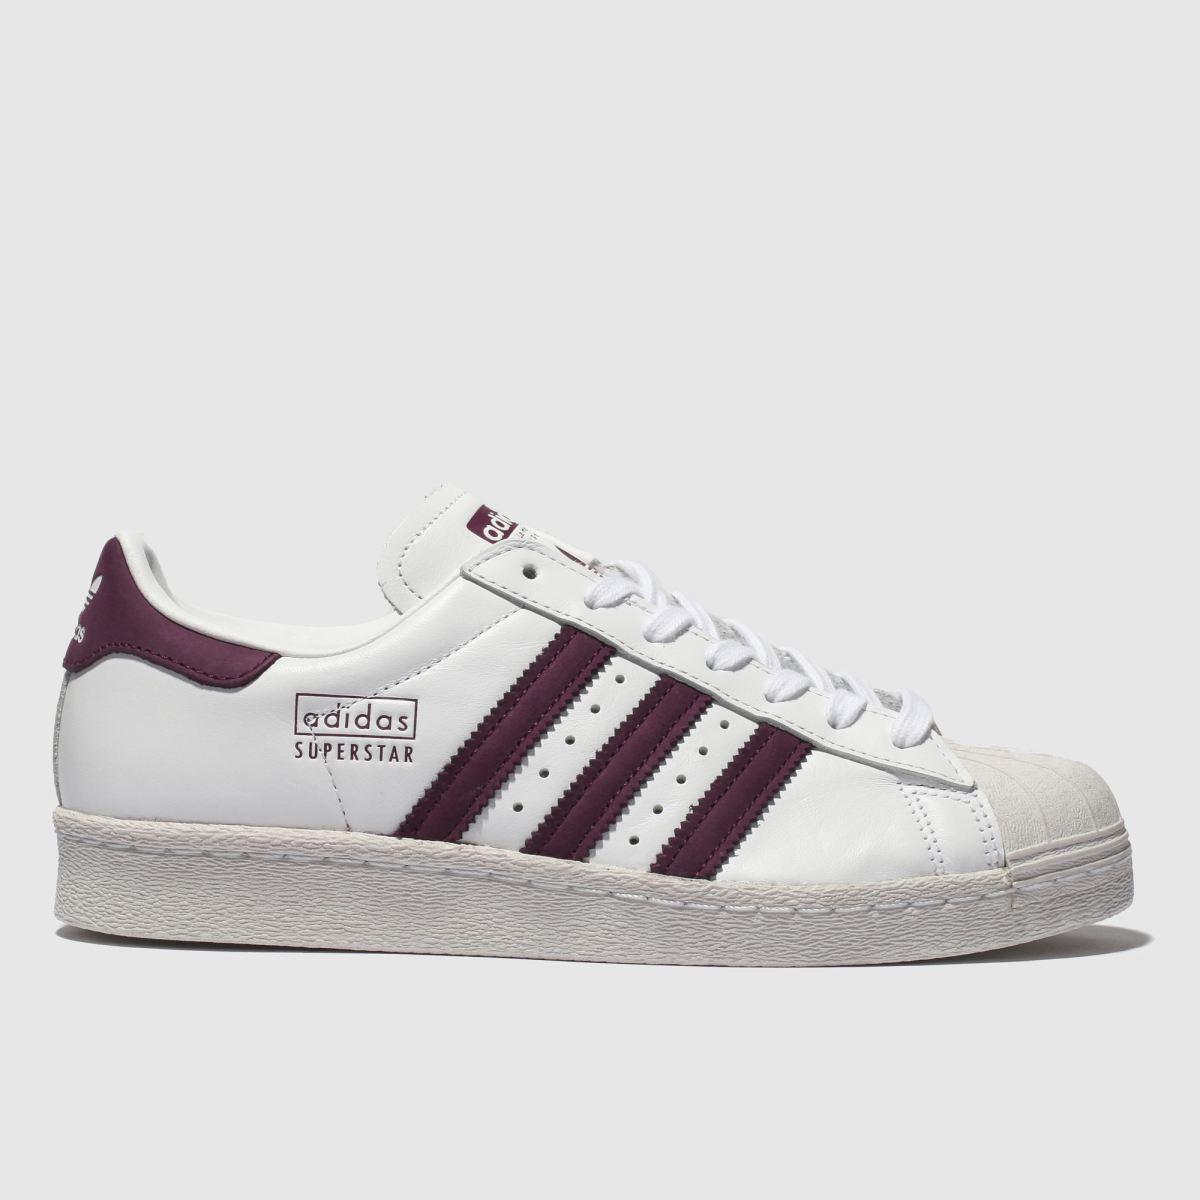 Adidas White & Burgundy Superstar Trainers